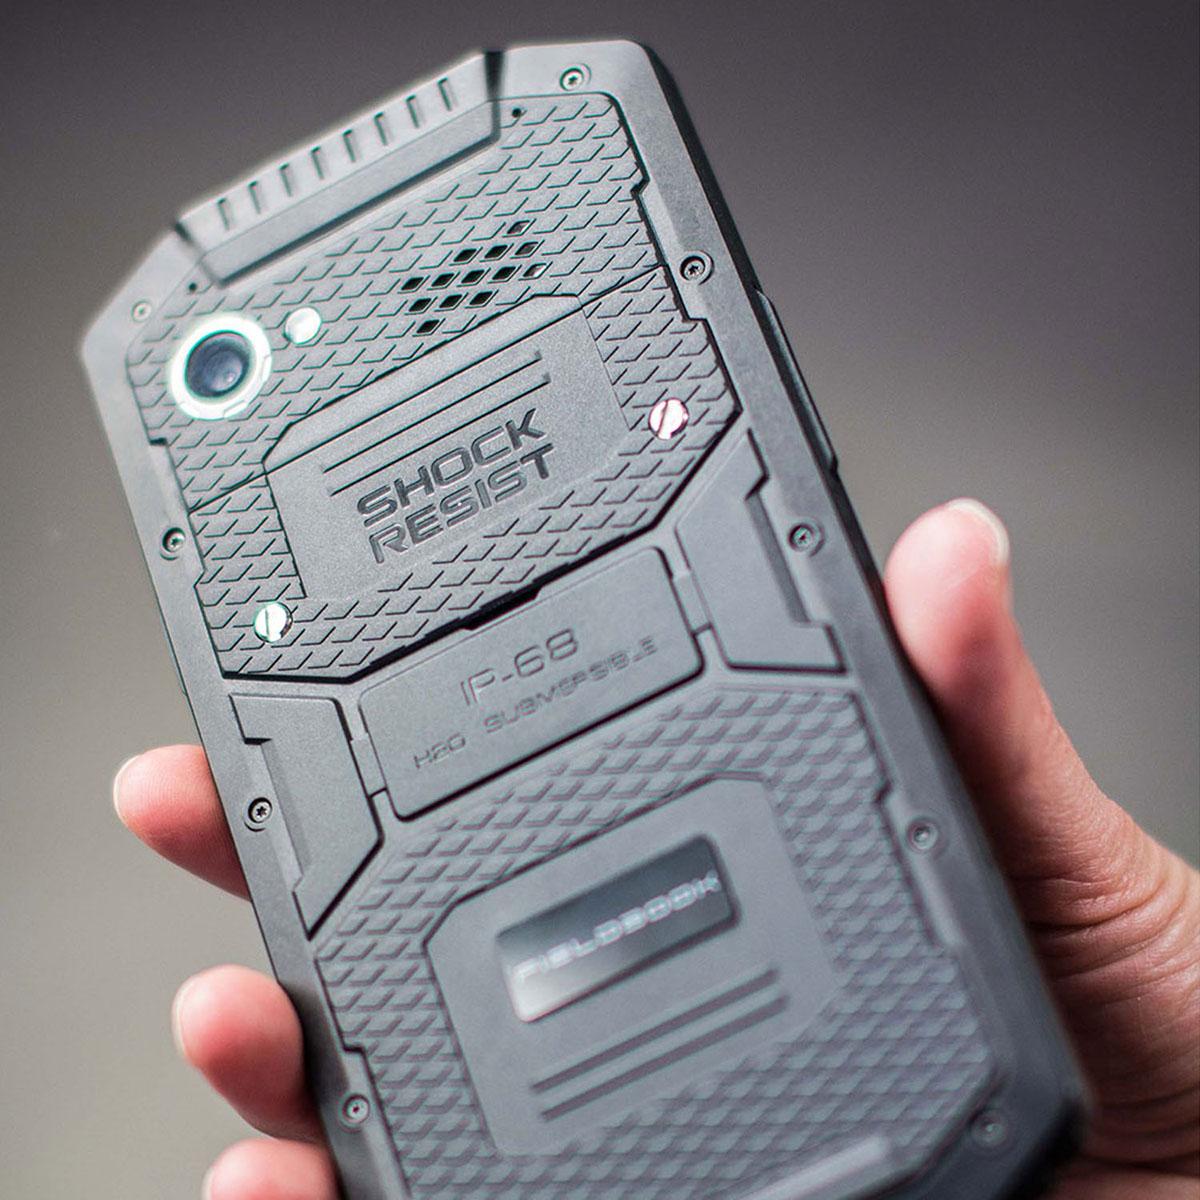 20-Fieldbook-F1-rugged-professional-smartphone-back-hand